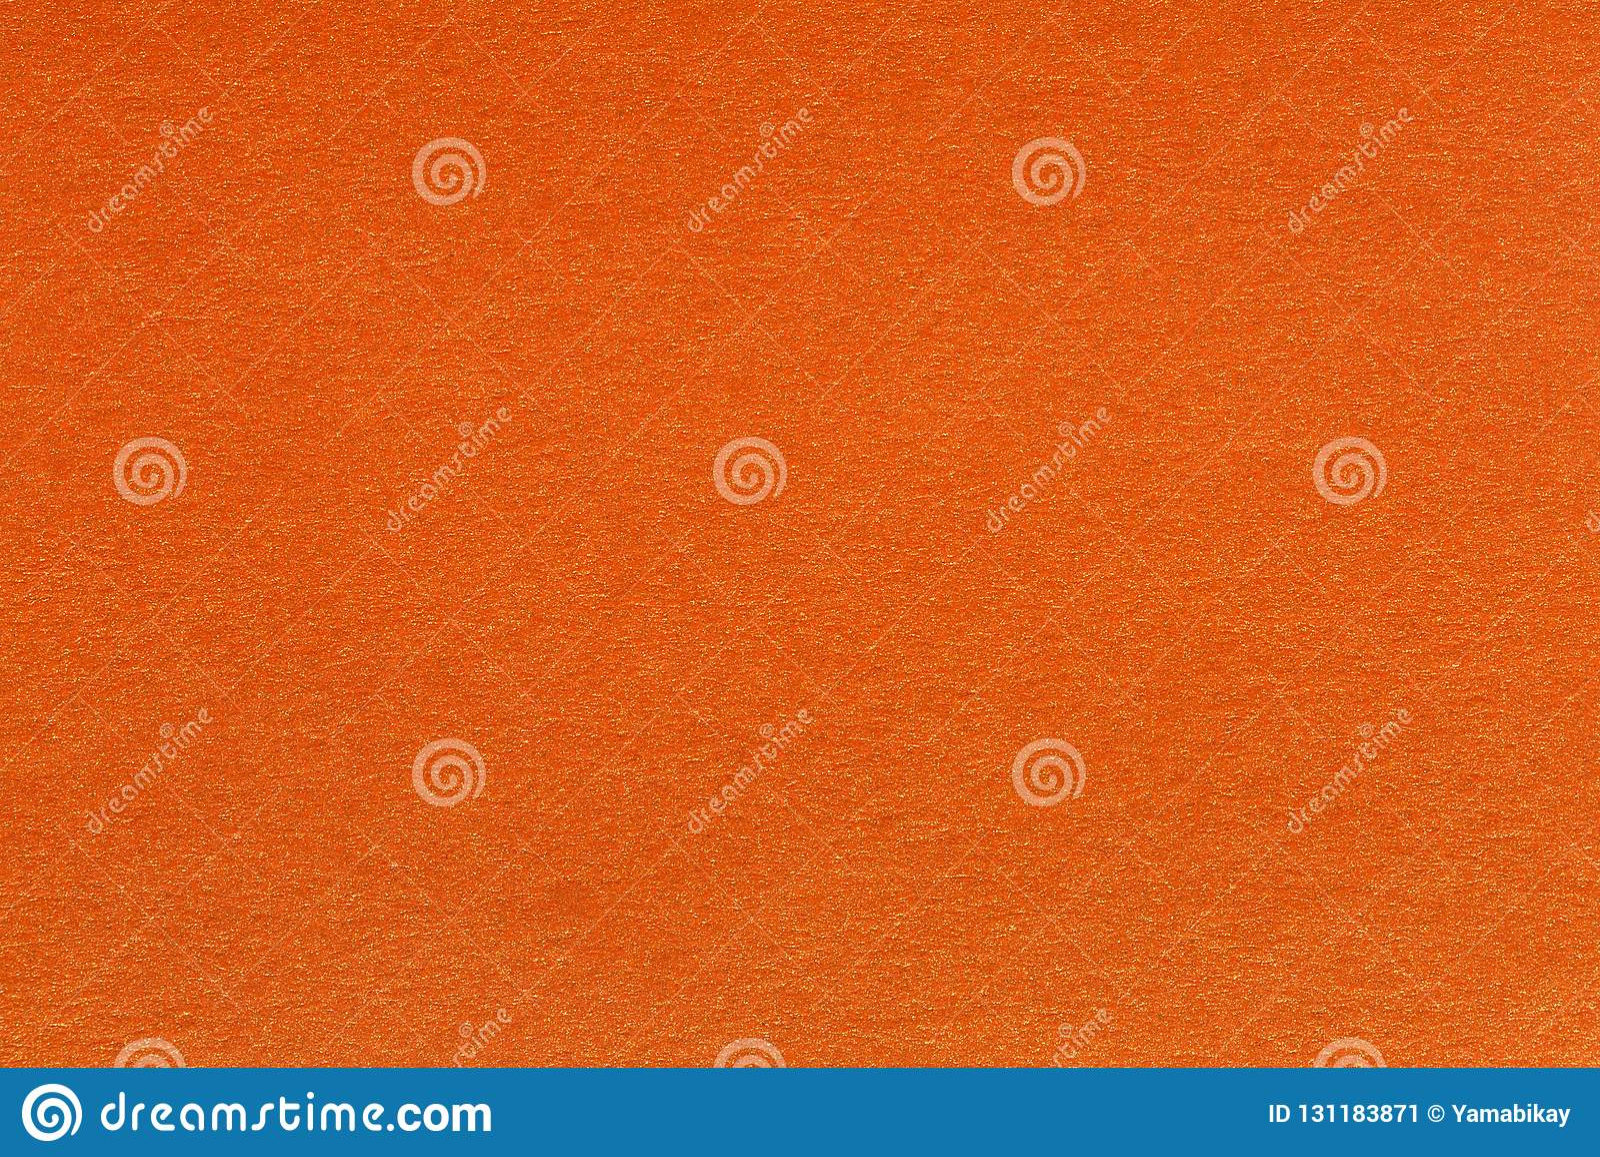 Abstract Orange Background Light Yellow Corner Spotlight